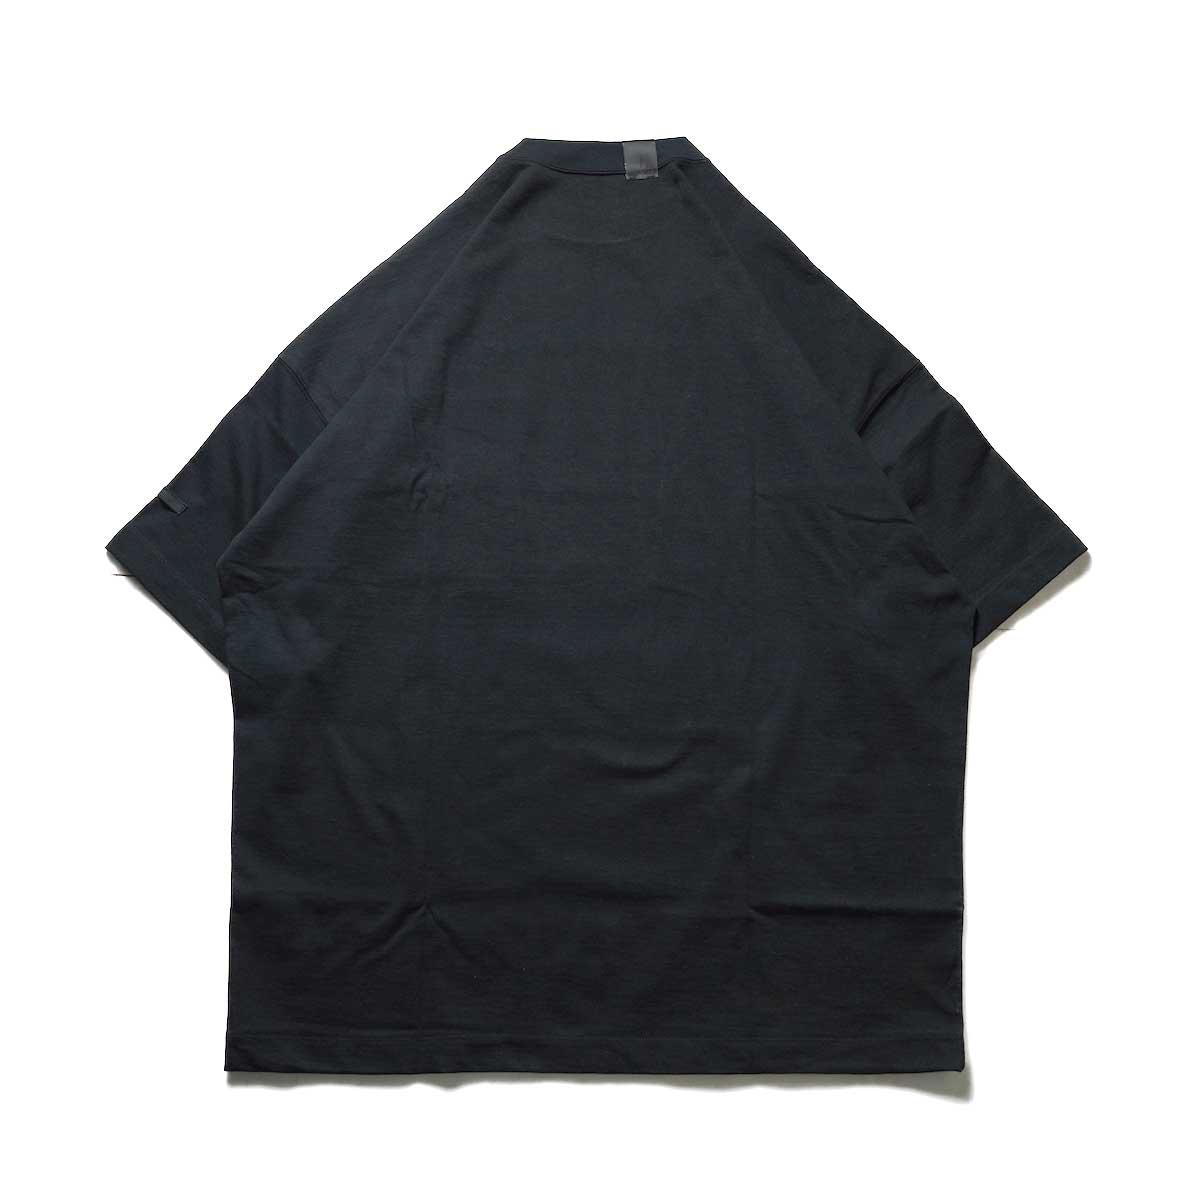 N.HOOLYWOOD / 2212-CS07-018 BIG T-Shirt (Black)背面